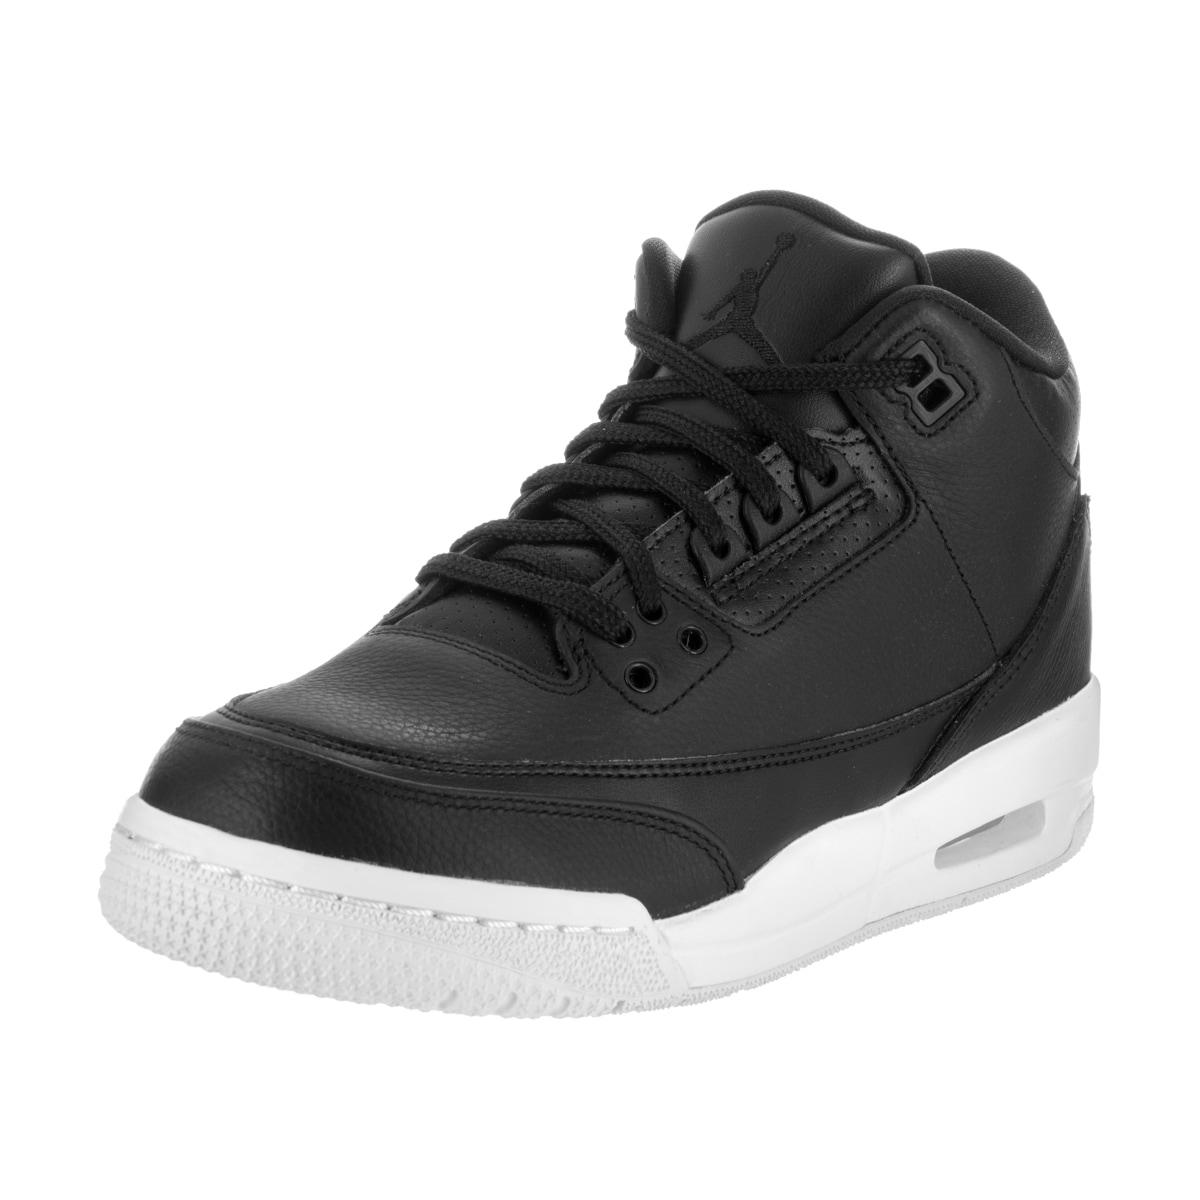 Nike Jordan Kids Air Jordan 3 Retro Black Leather Basketb...